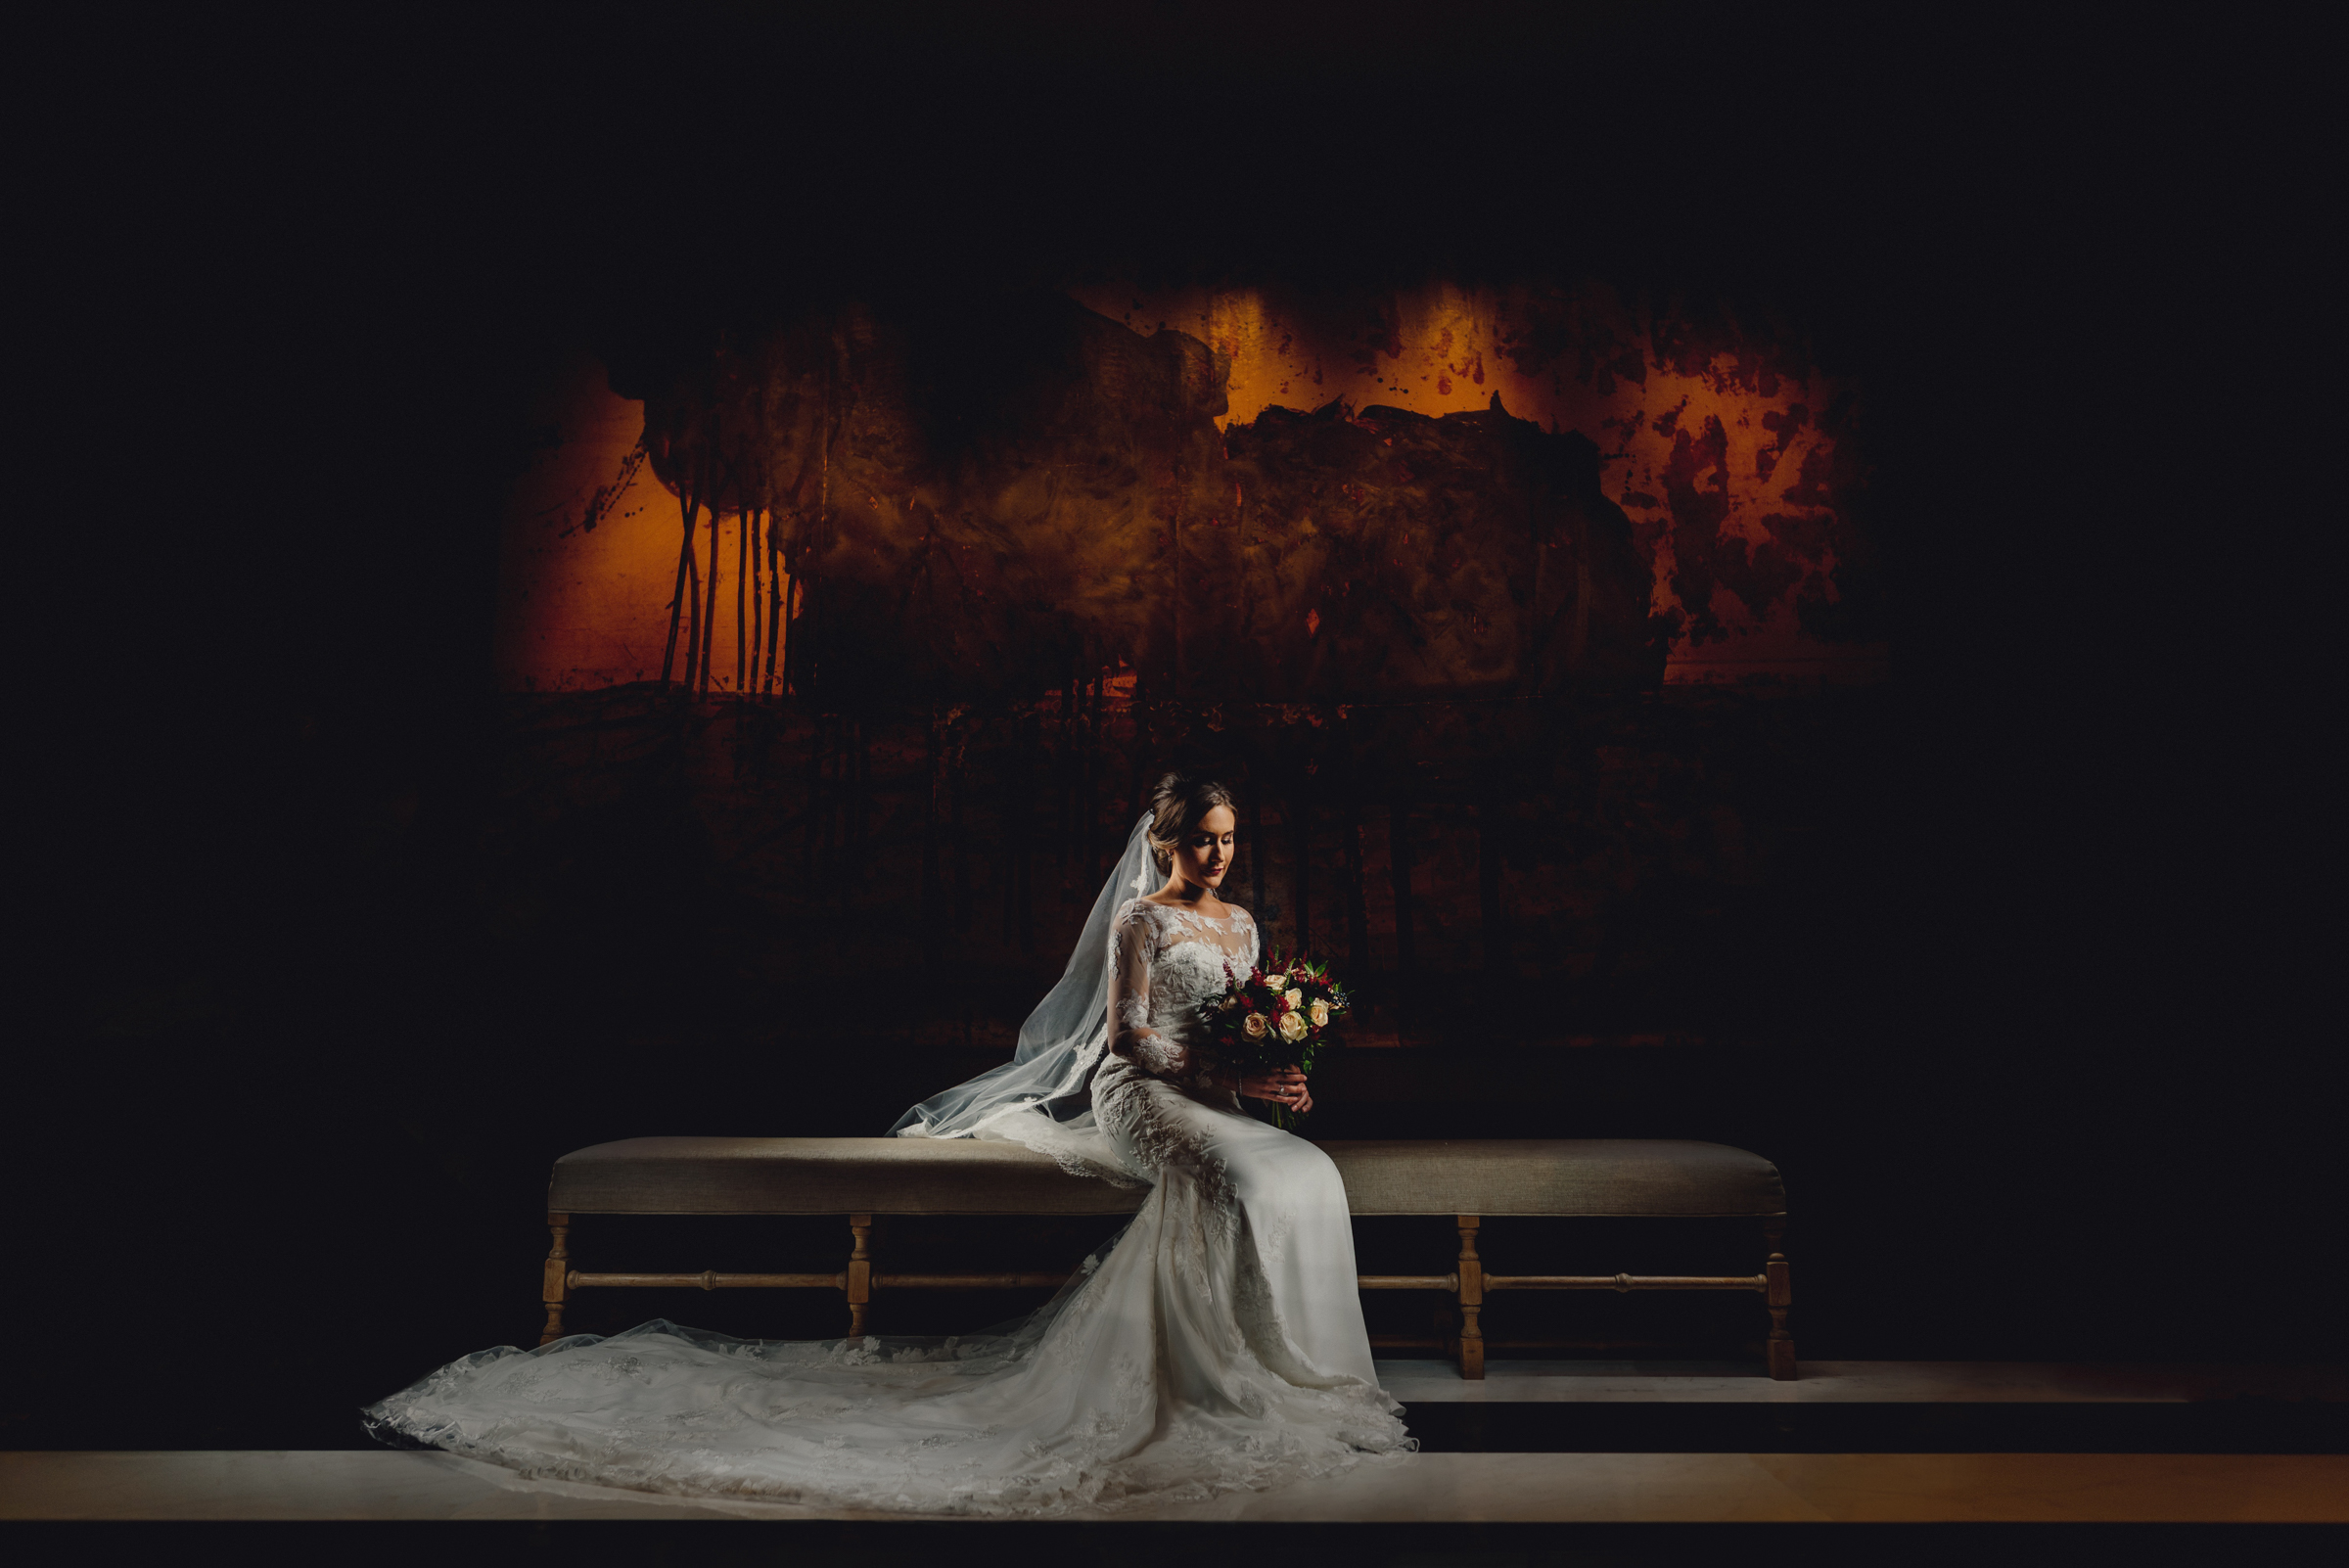 Seated bride portrait against dark background - photo by MIKI Studios